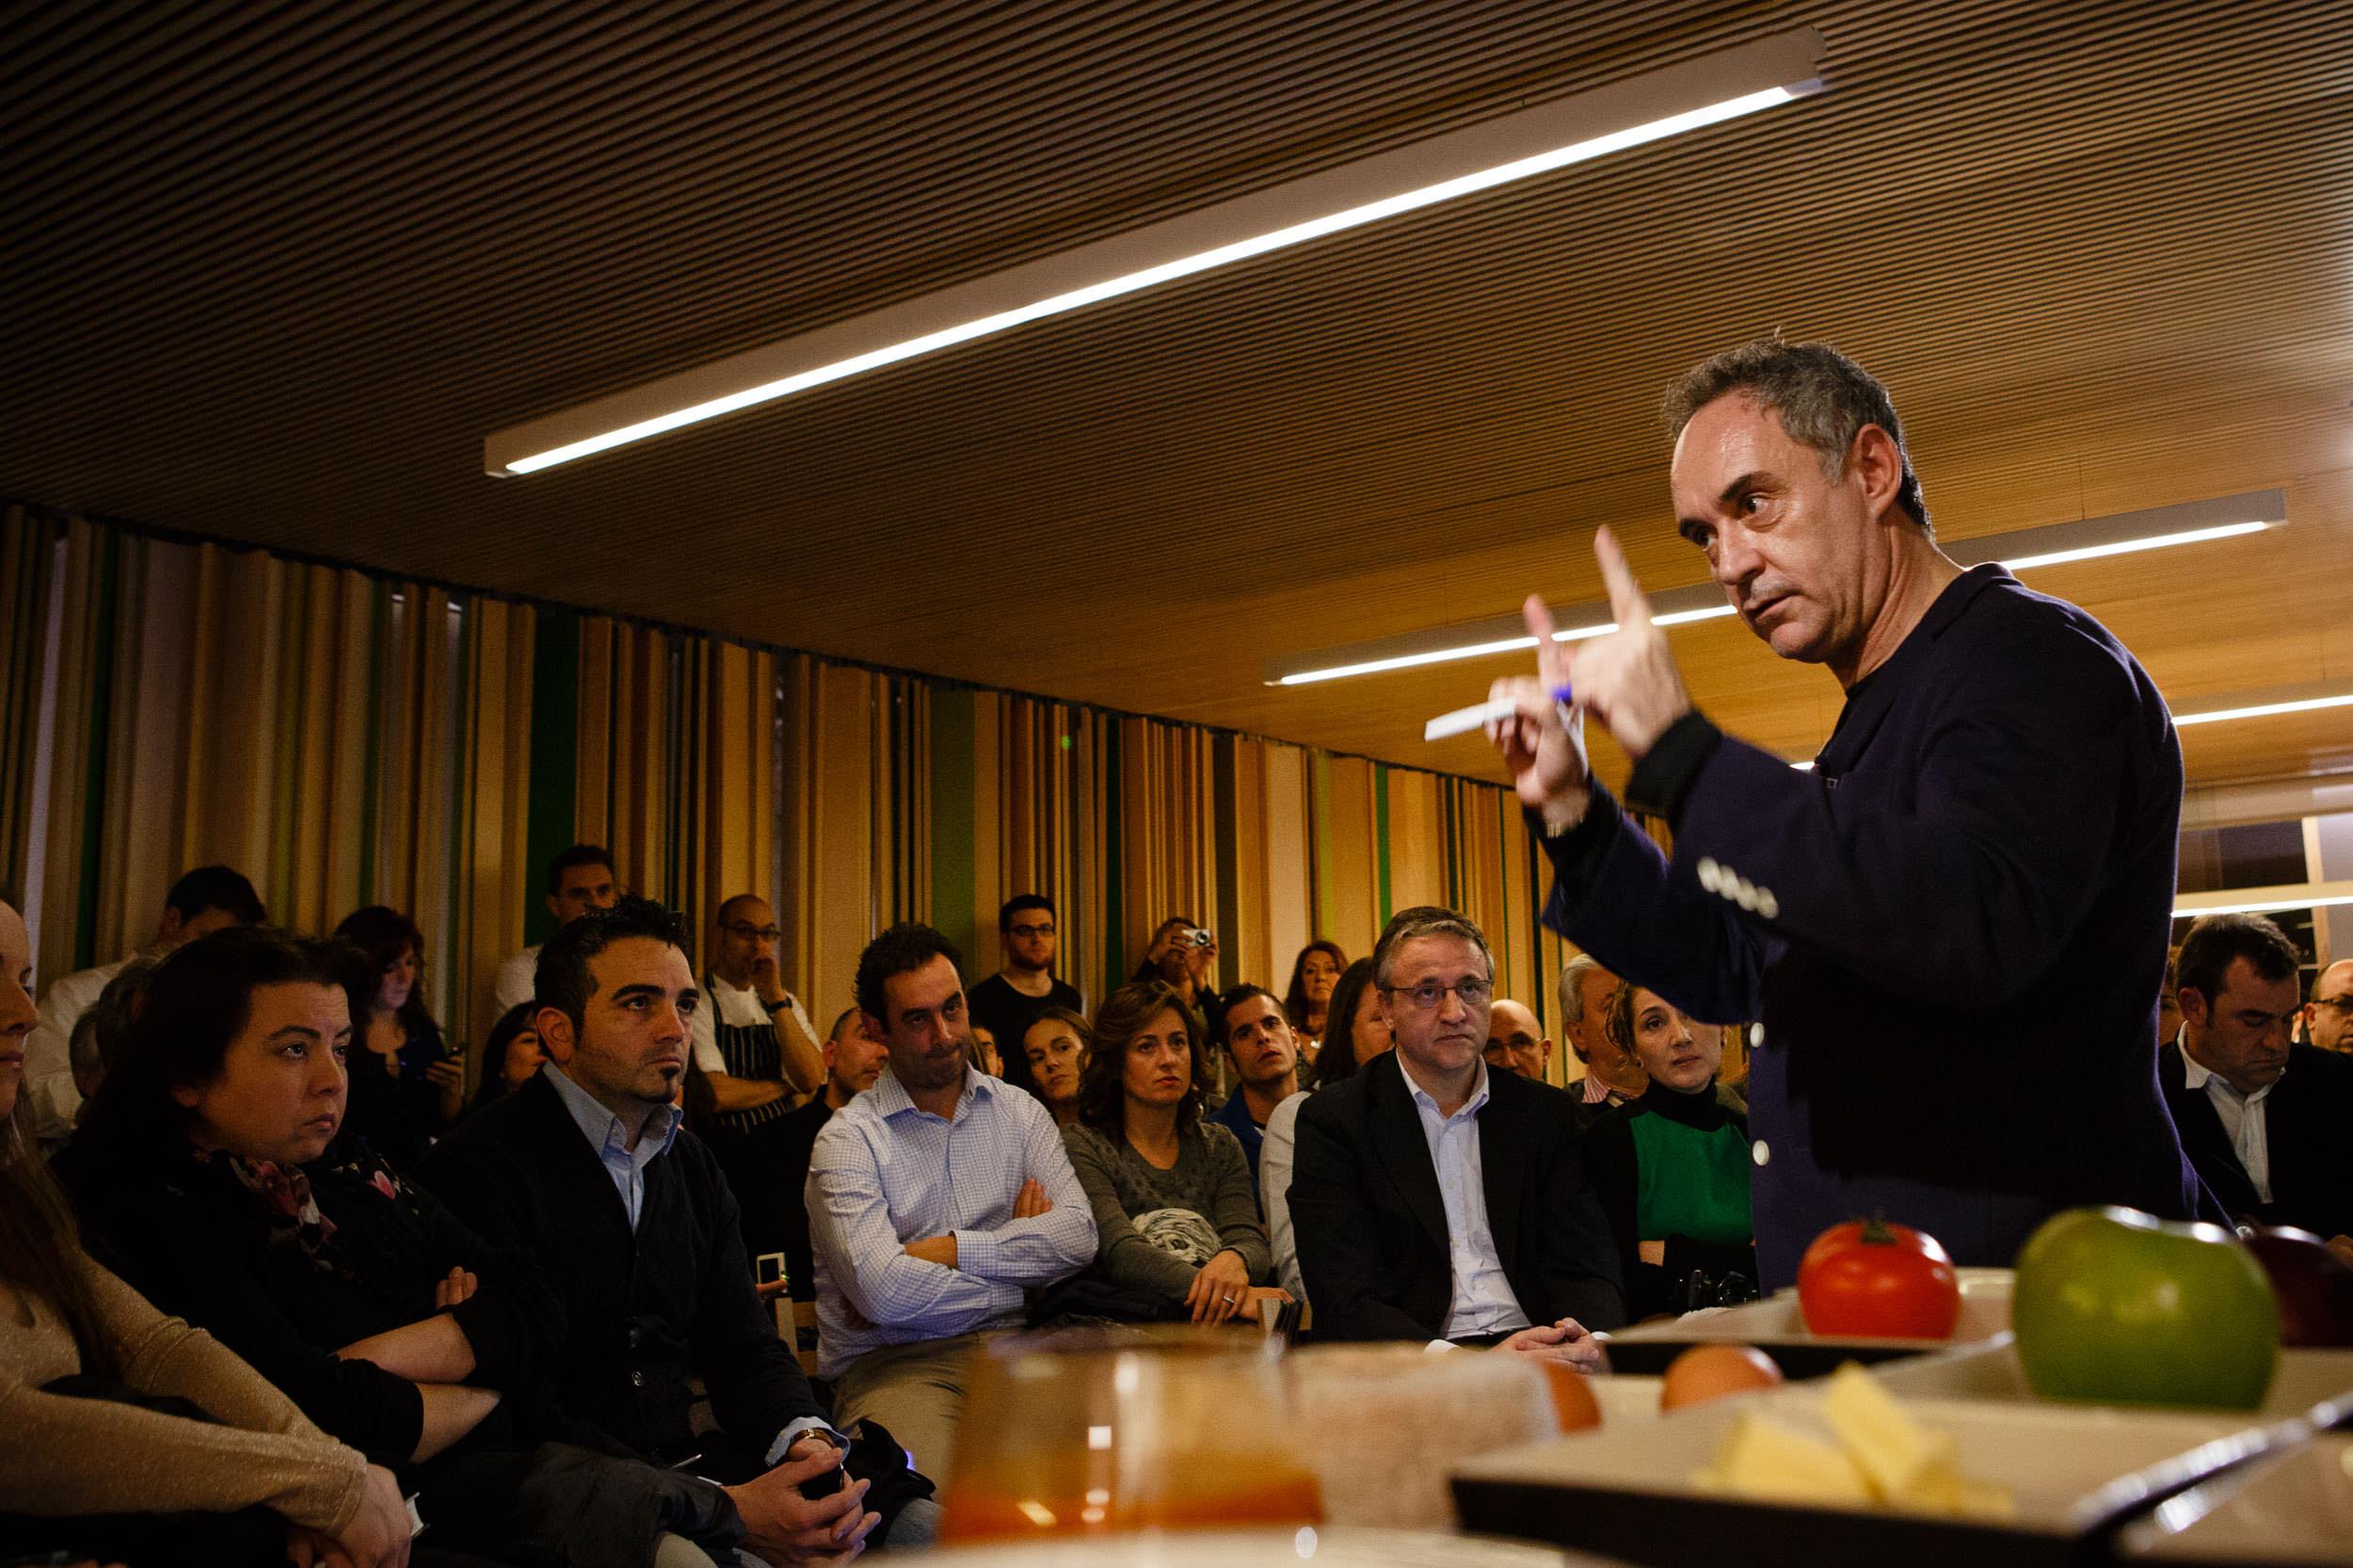 Mejor Fotografia Comercial y Editorial La Rioja y Pais Vasco Espana - James Sturcke - sturcke.org_007.jpg